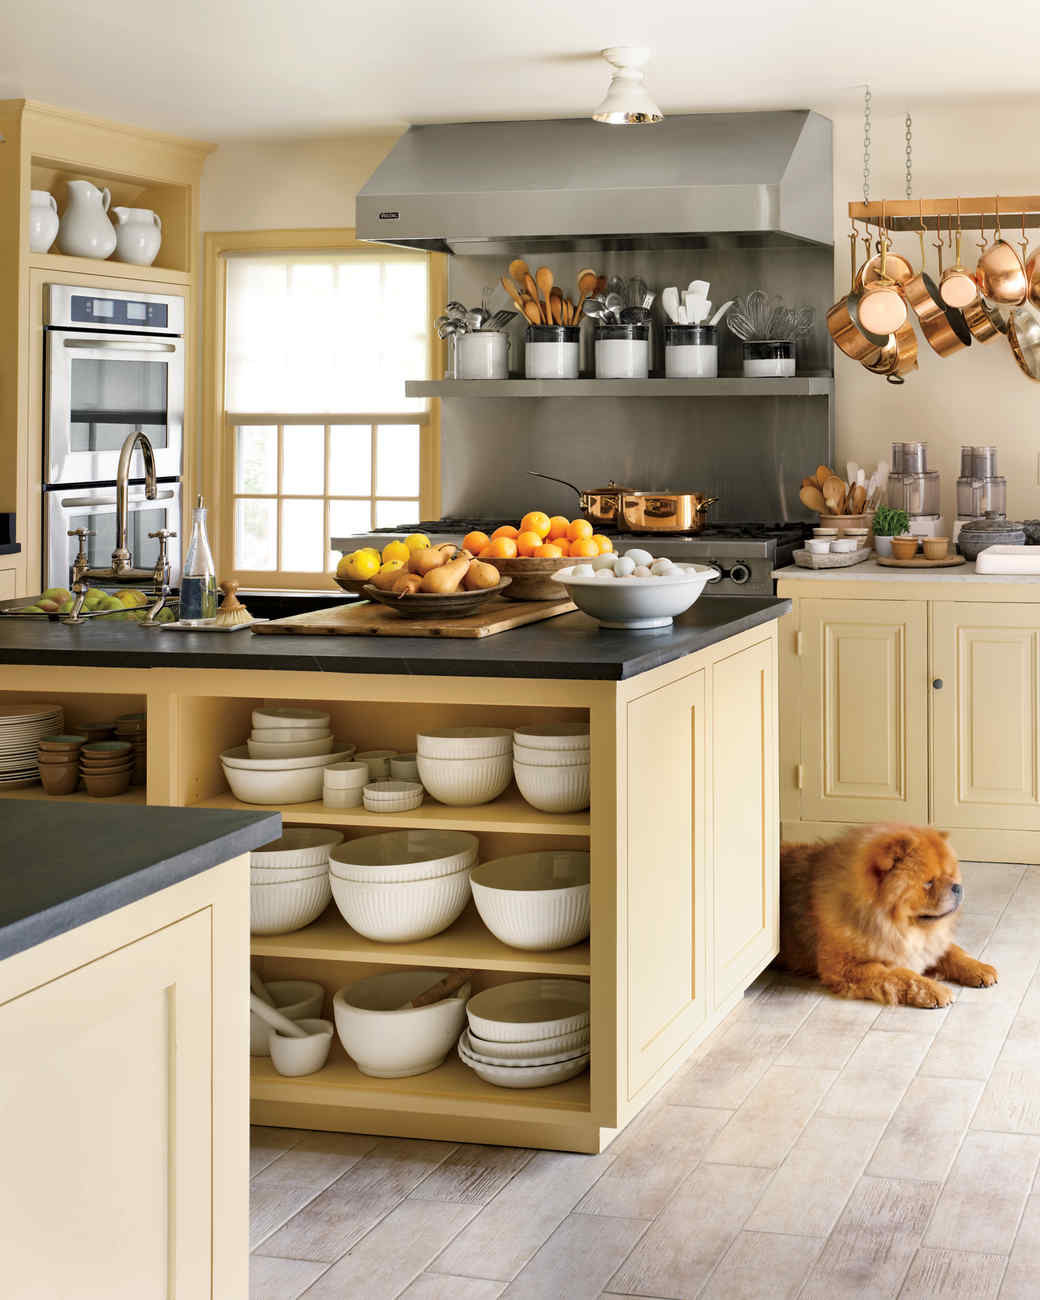 marthas-kitchen-stove-mld107949.jpg